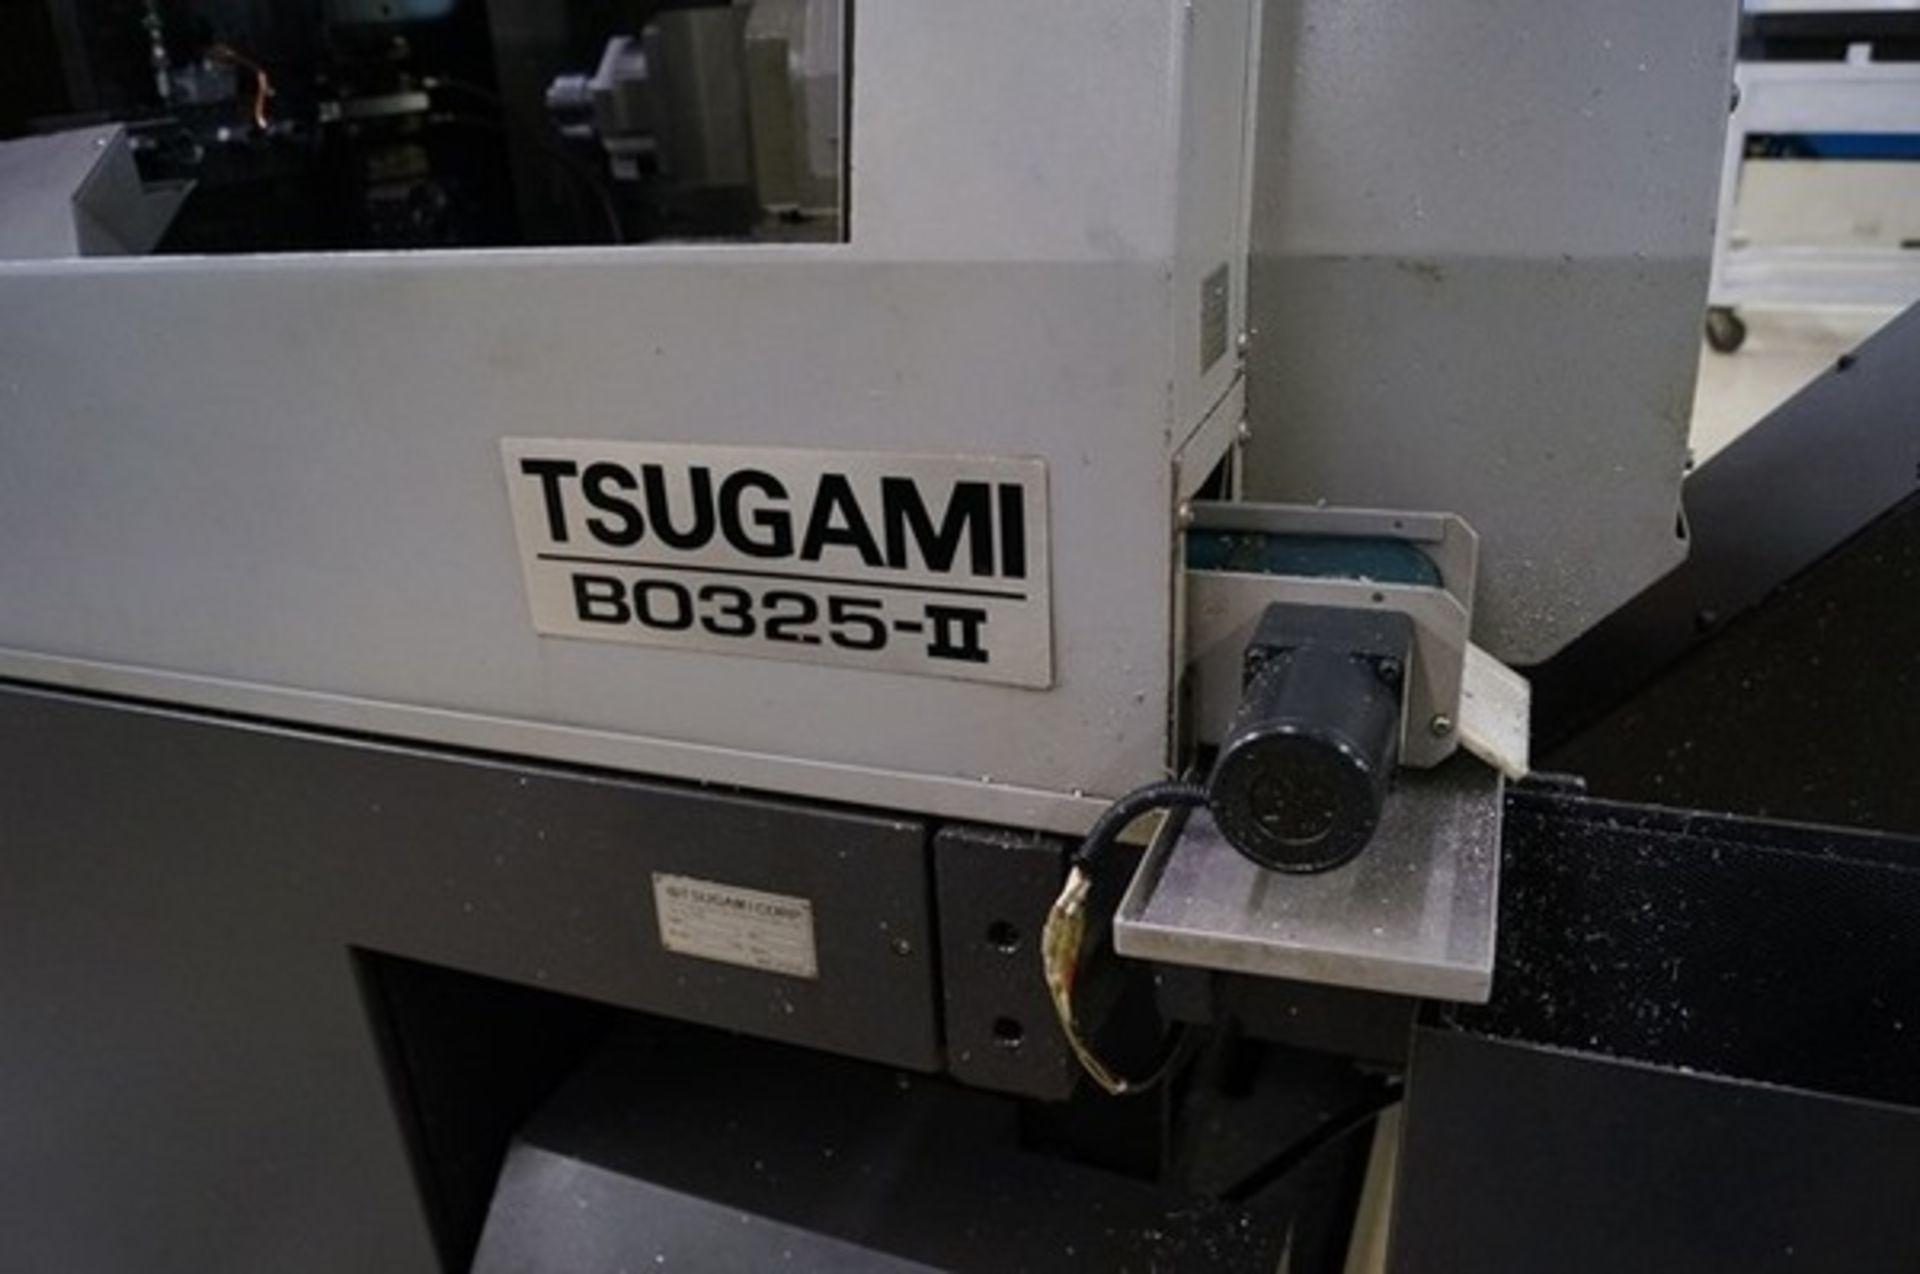 Lot 3F - 2014 TSUGAMI BO325II CNC SWISS LATHE, HIGH PRESSURE COOLANT, LNS ALPHA 538 MAGAZINE BAR FEED, CAPACI